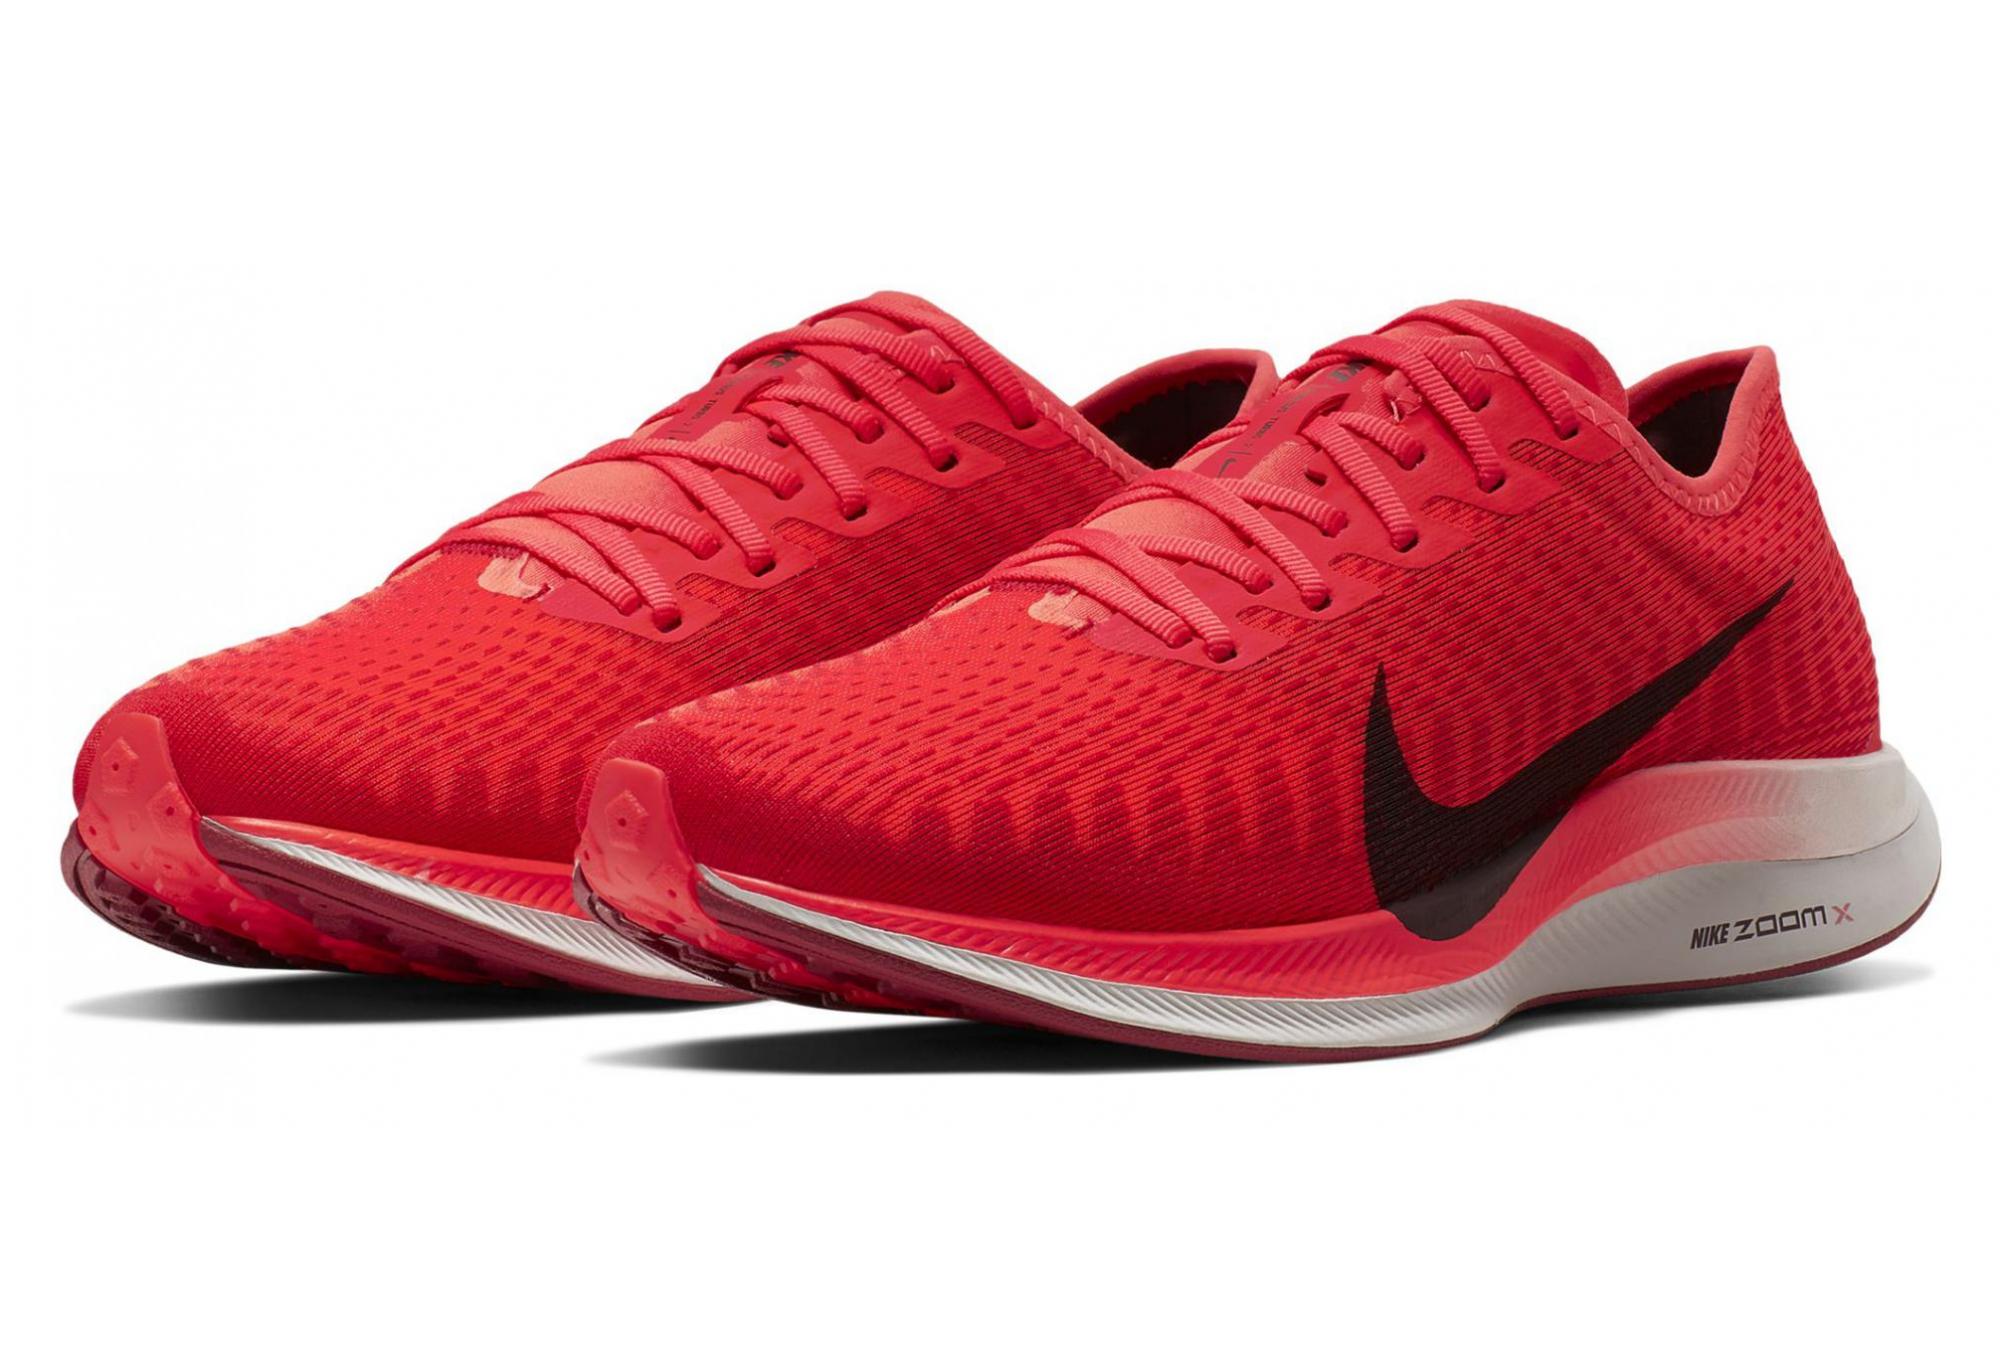 taille 40 e293e ef299 Nike Zoom Pegasus Turbo 2 Rouge Homme